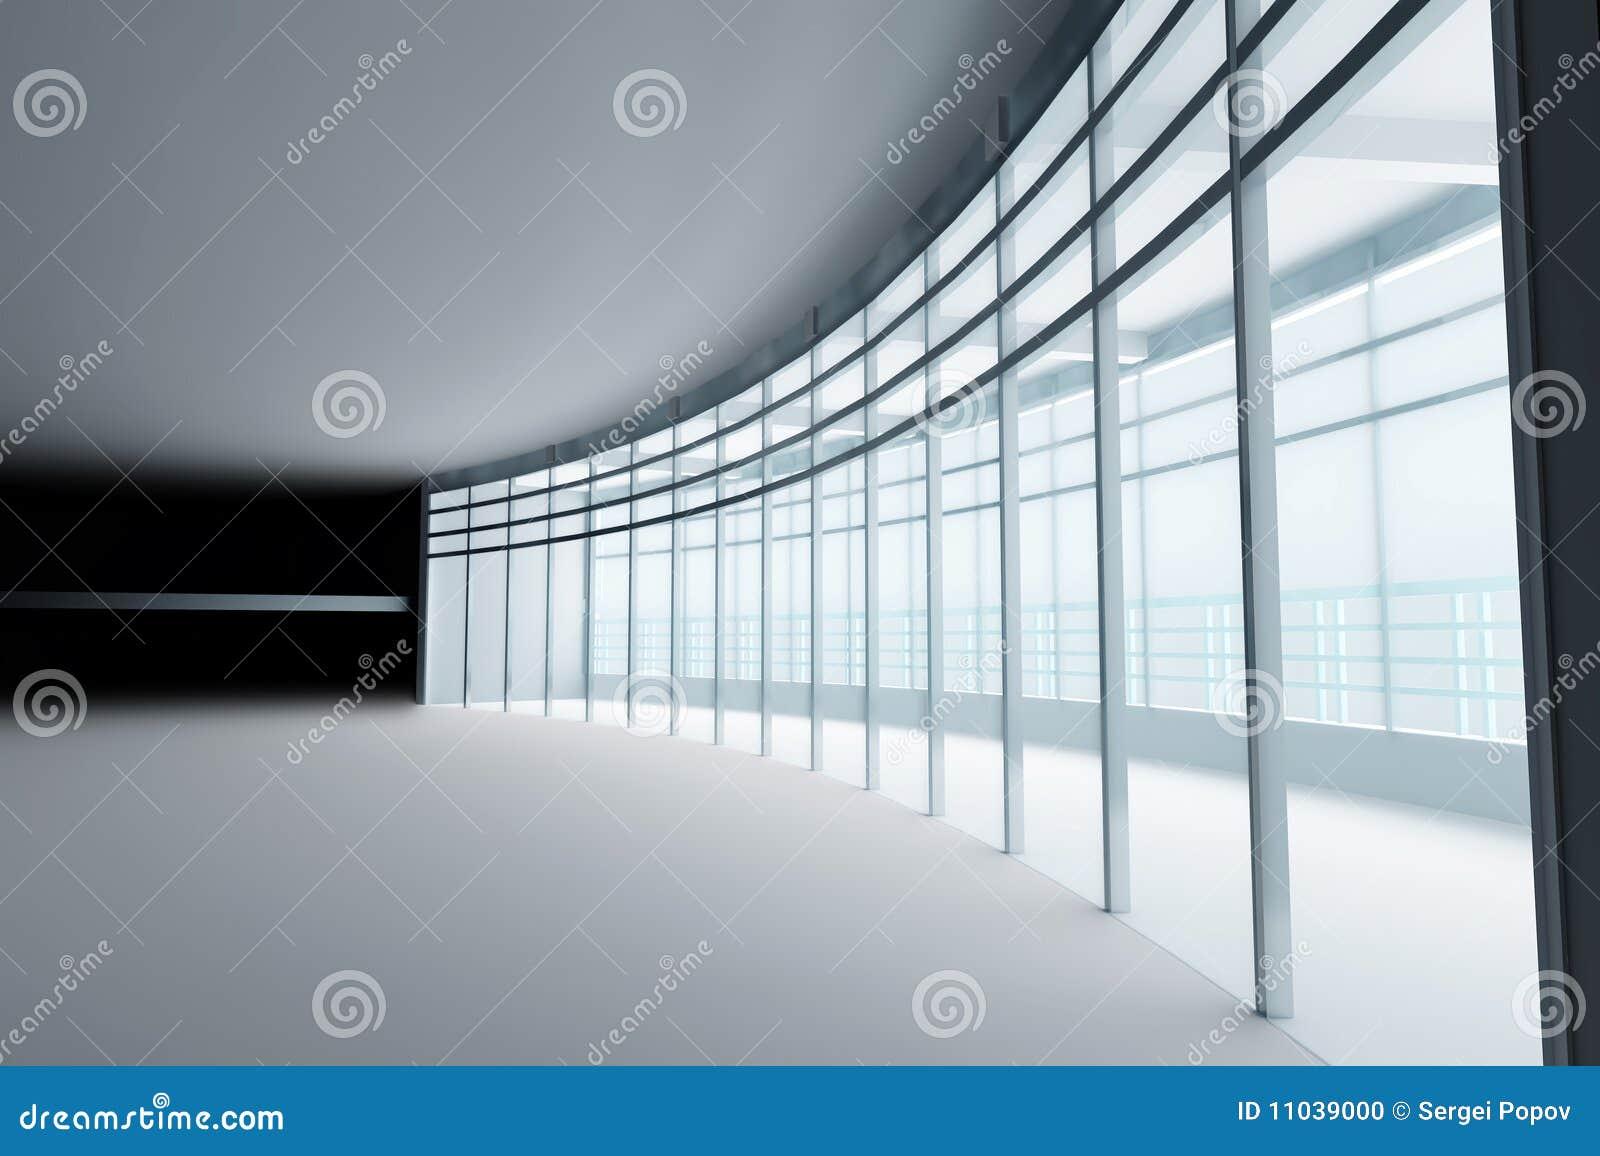 Hall with glass windows